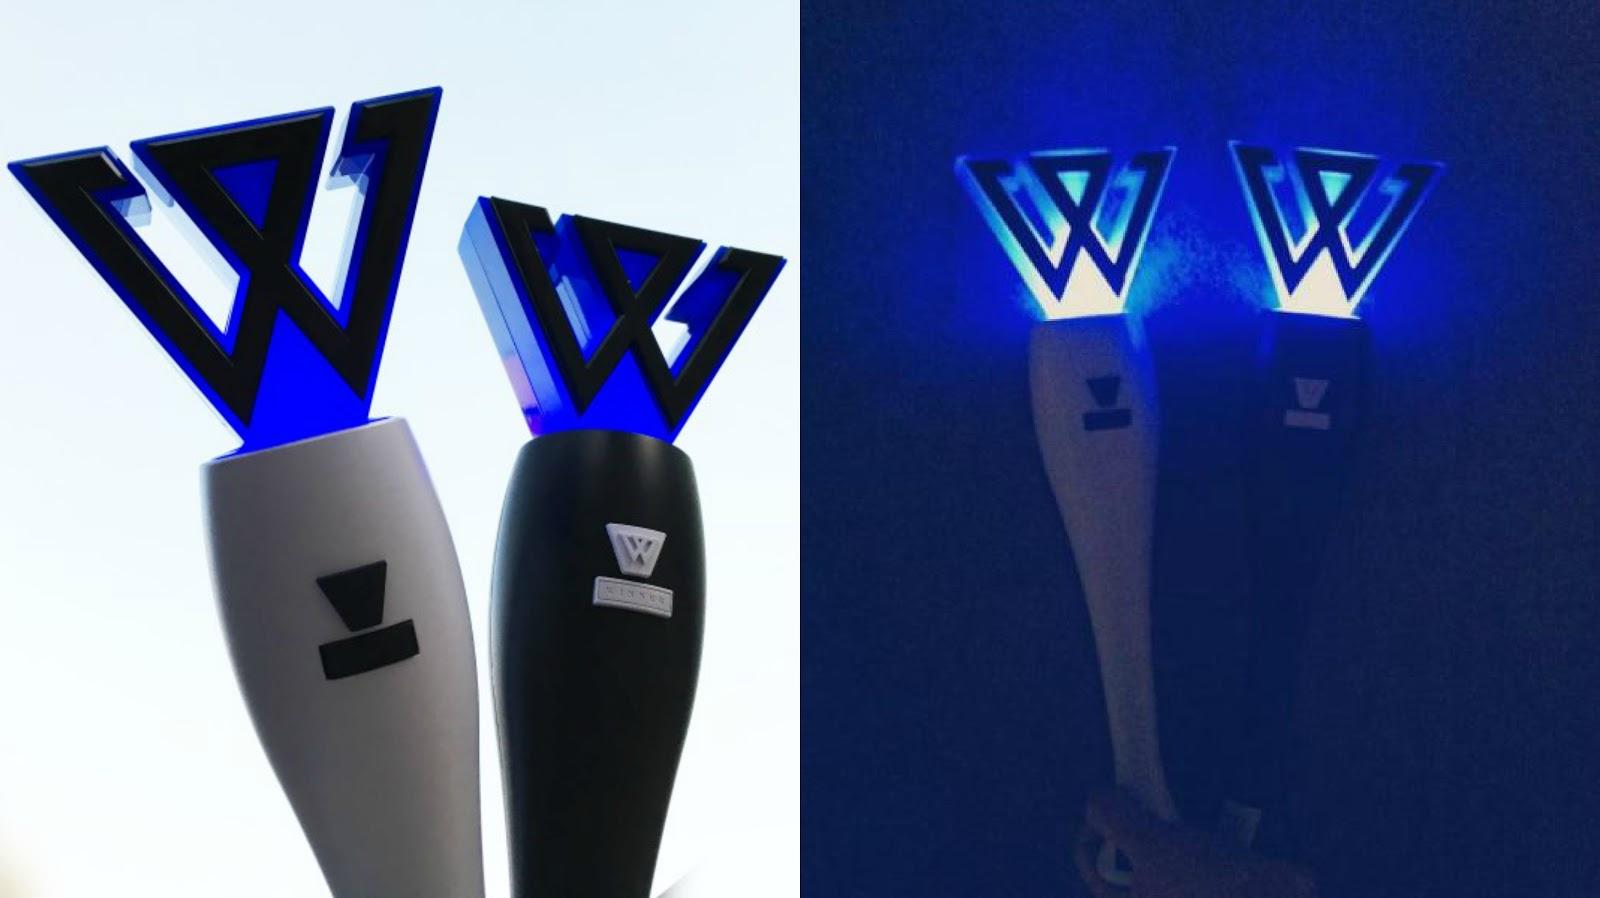 7 Most Unique Fandom Light Sticks In K-Pop